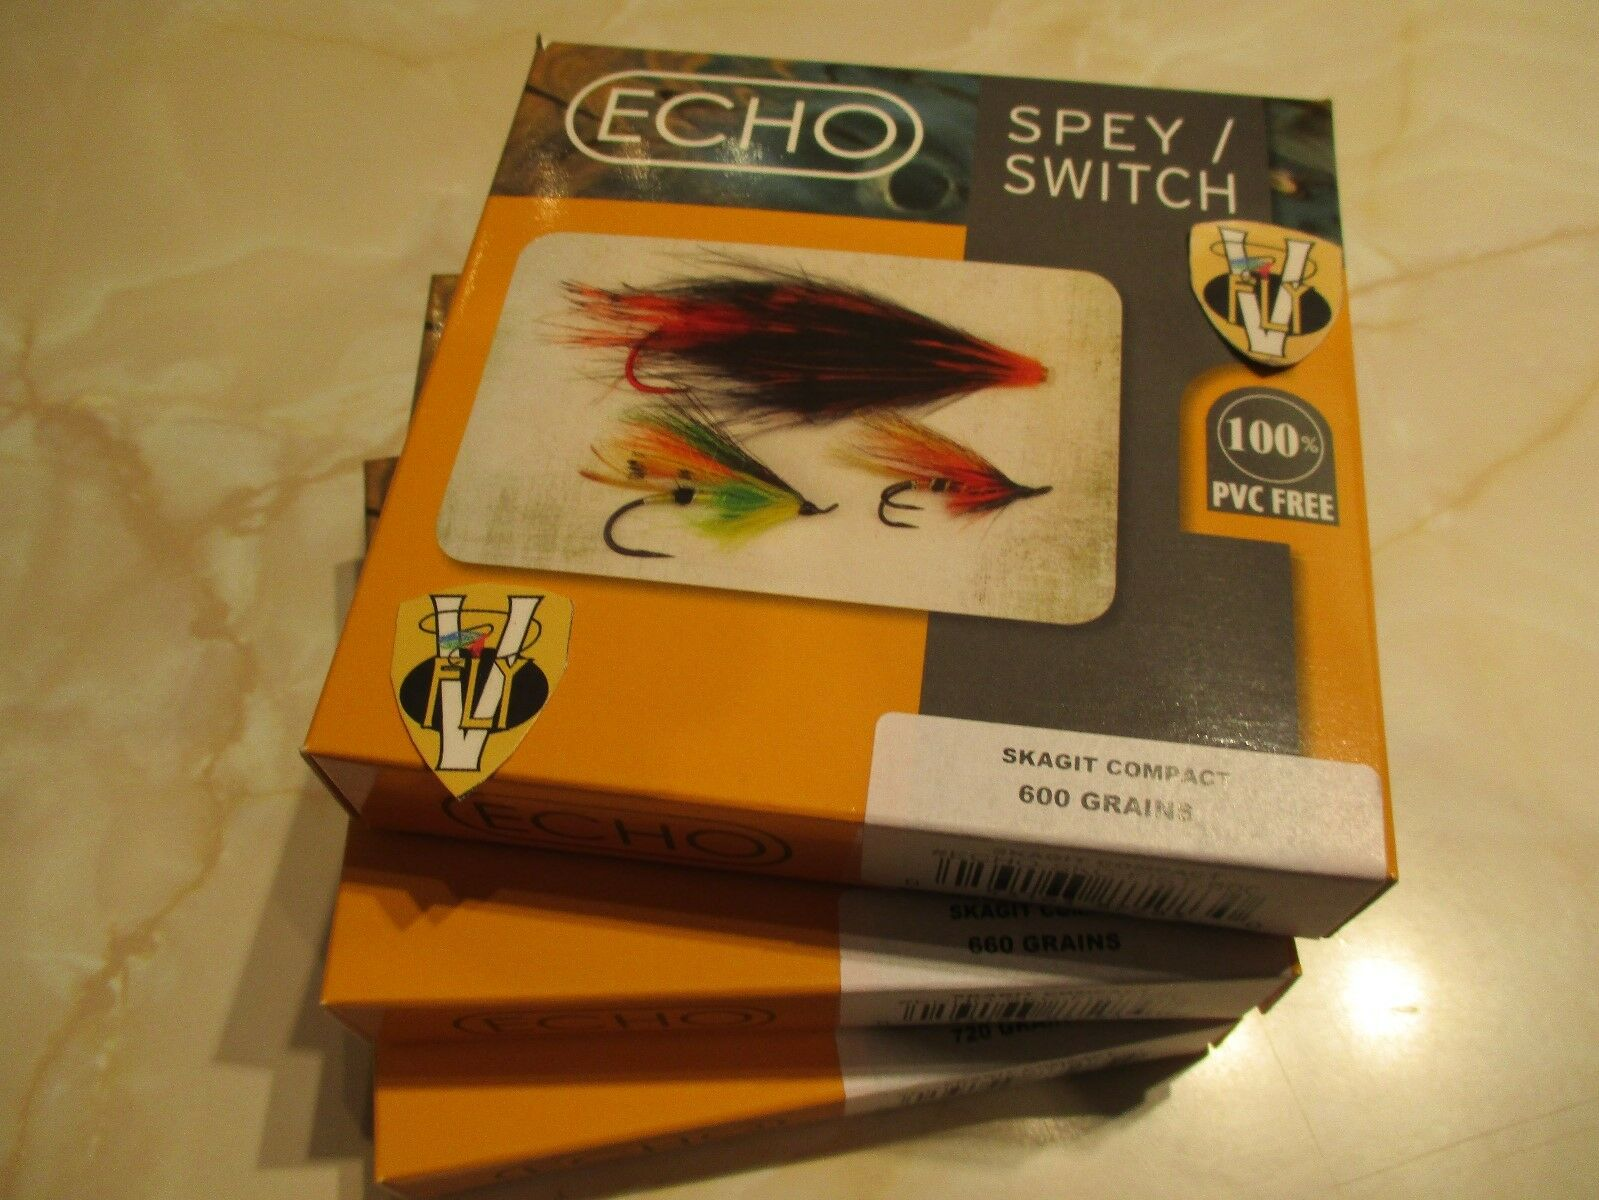 New Echo F I S T Skagit Compact Triple Density Spey Skagit Fly Lines